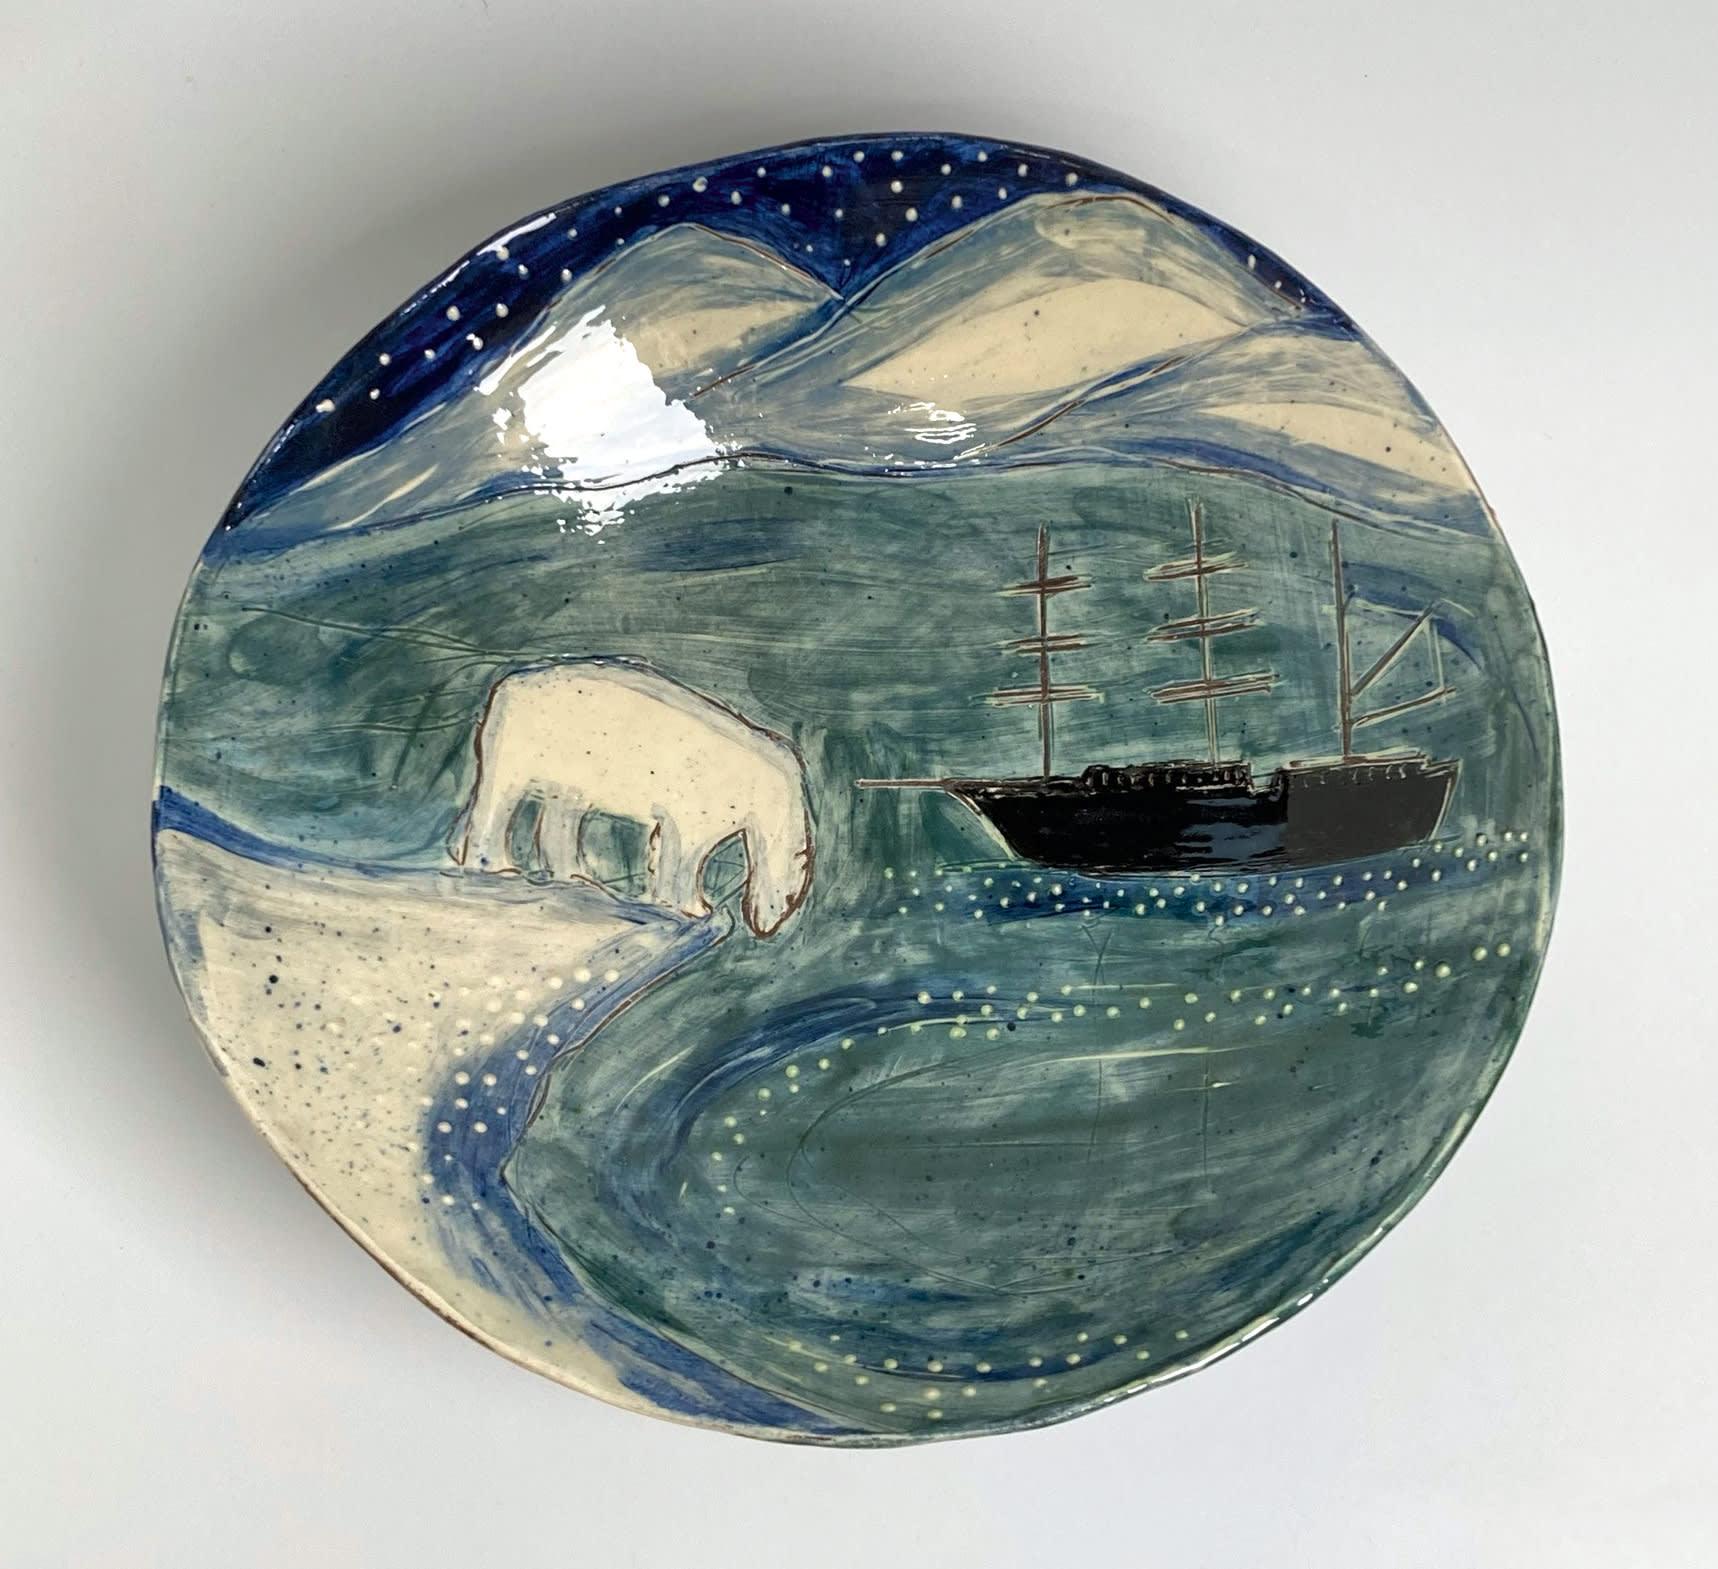 "<span class=""link fancybox-details-link""><a href=""/artists/428-anne-barrell/works/7692-anne-barrell-polar-bear-2021/"">View Detail Page</a></span><div class=""artist""><strong>Anne Barrell</strong></div> <div class=""title""><em>Polar Bear</em>, 2021</div> <div class=""medium"">handmade, hand-painted ceramic </div> <div class=""dimensions"">h. 27 x w. 9 cm </div><div class=""price"">£170.00</div><div class=""copyright_line"">Own Art: £17 x 10 Months, 0% APR</div>"